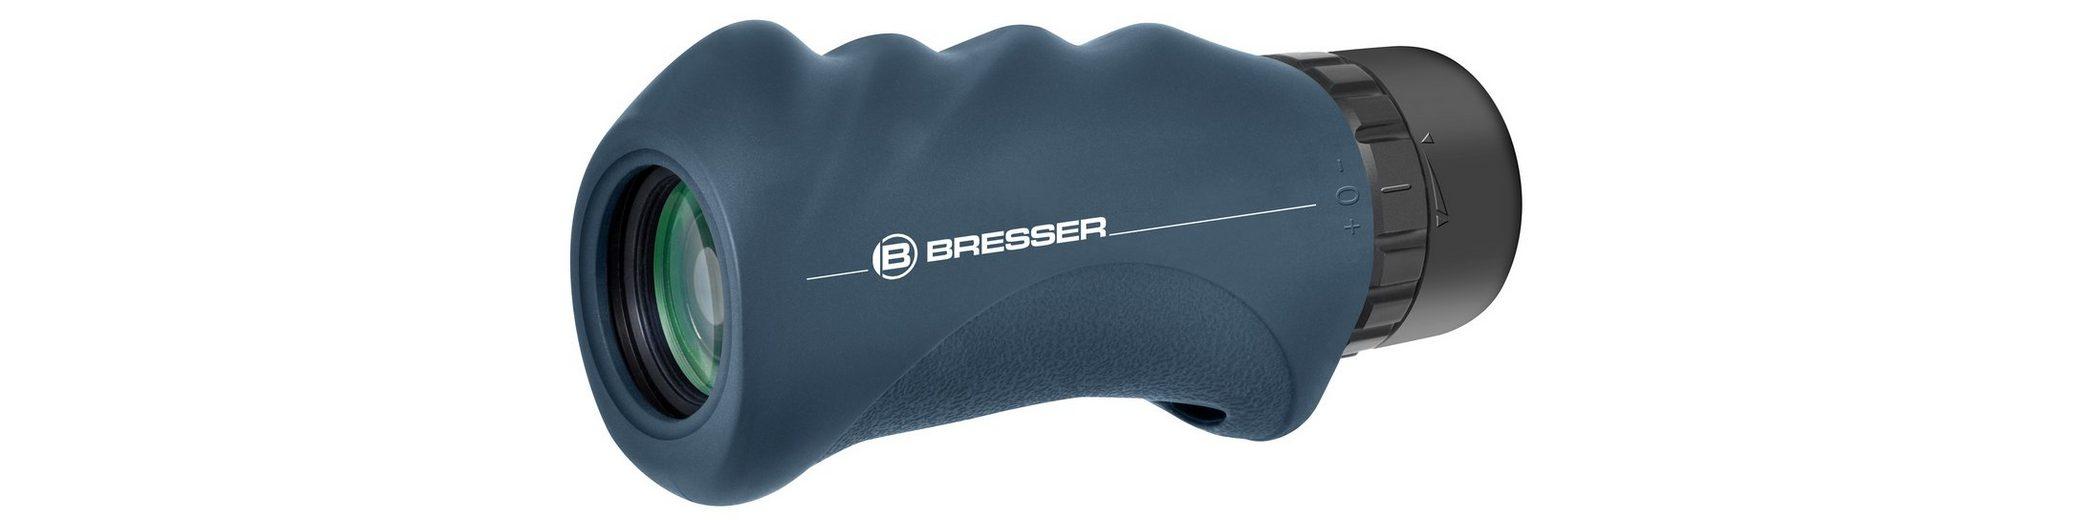 Bresser Monokular »BRESSER Nautic 8x25 mono«